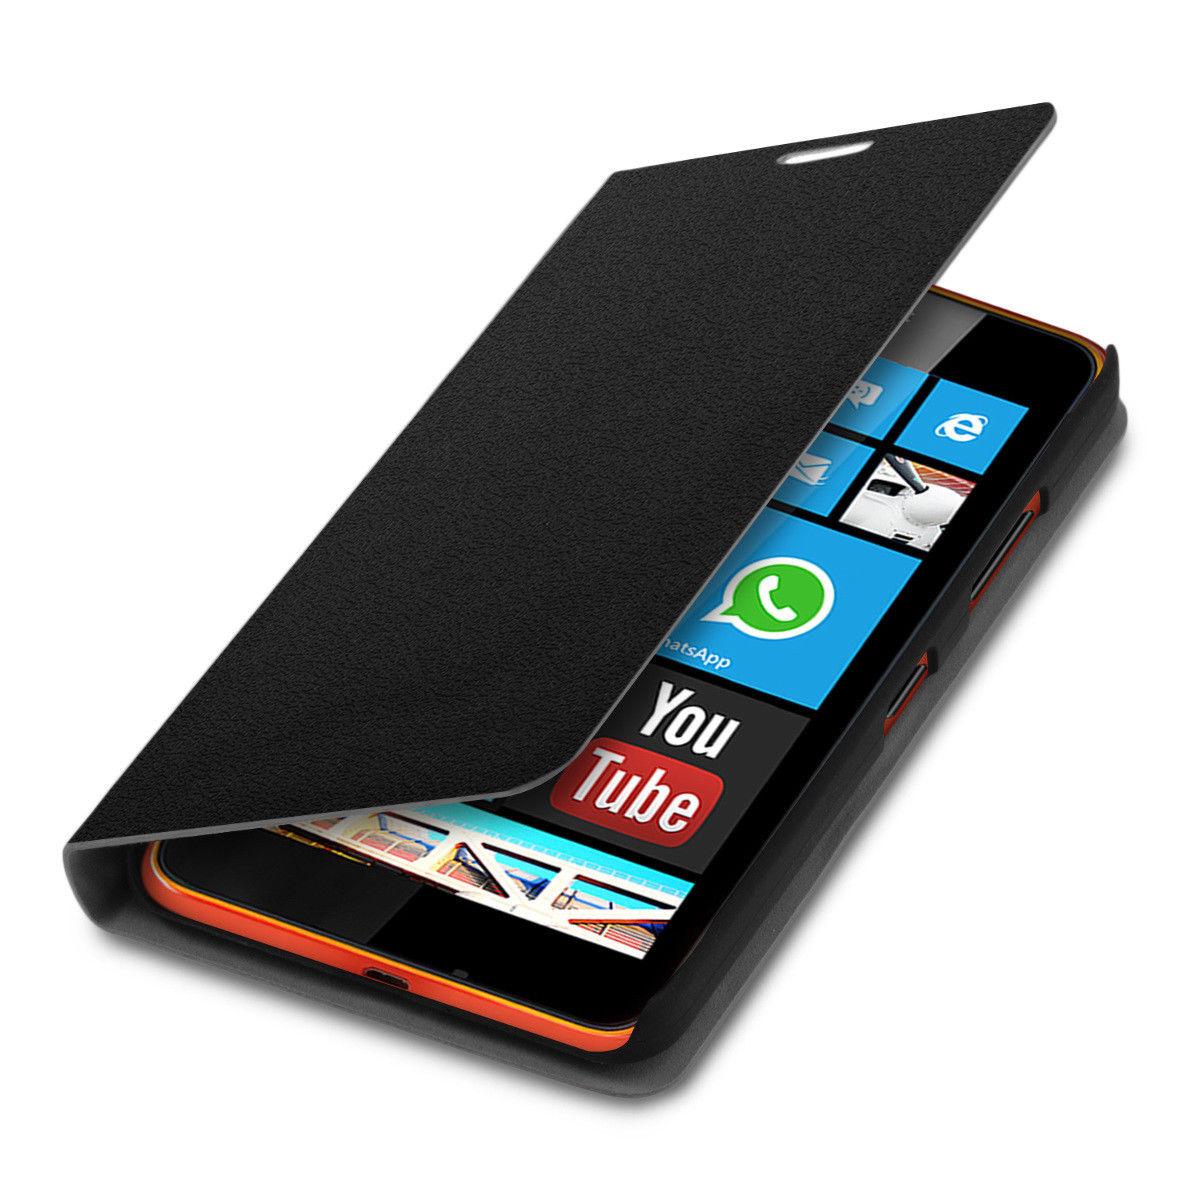 Pouzdro FLIP pro Microsoft Lumia 640 černé